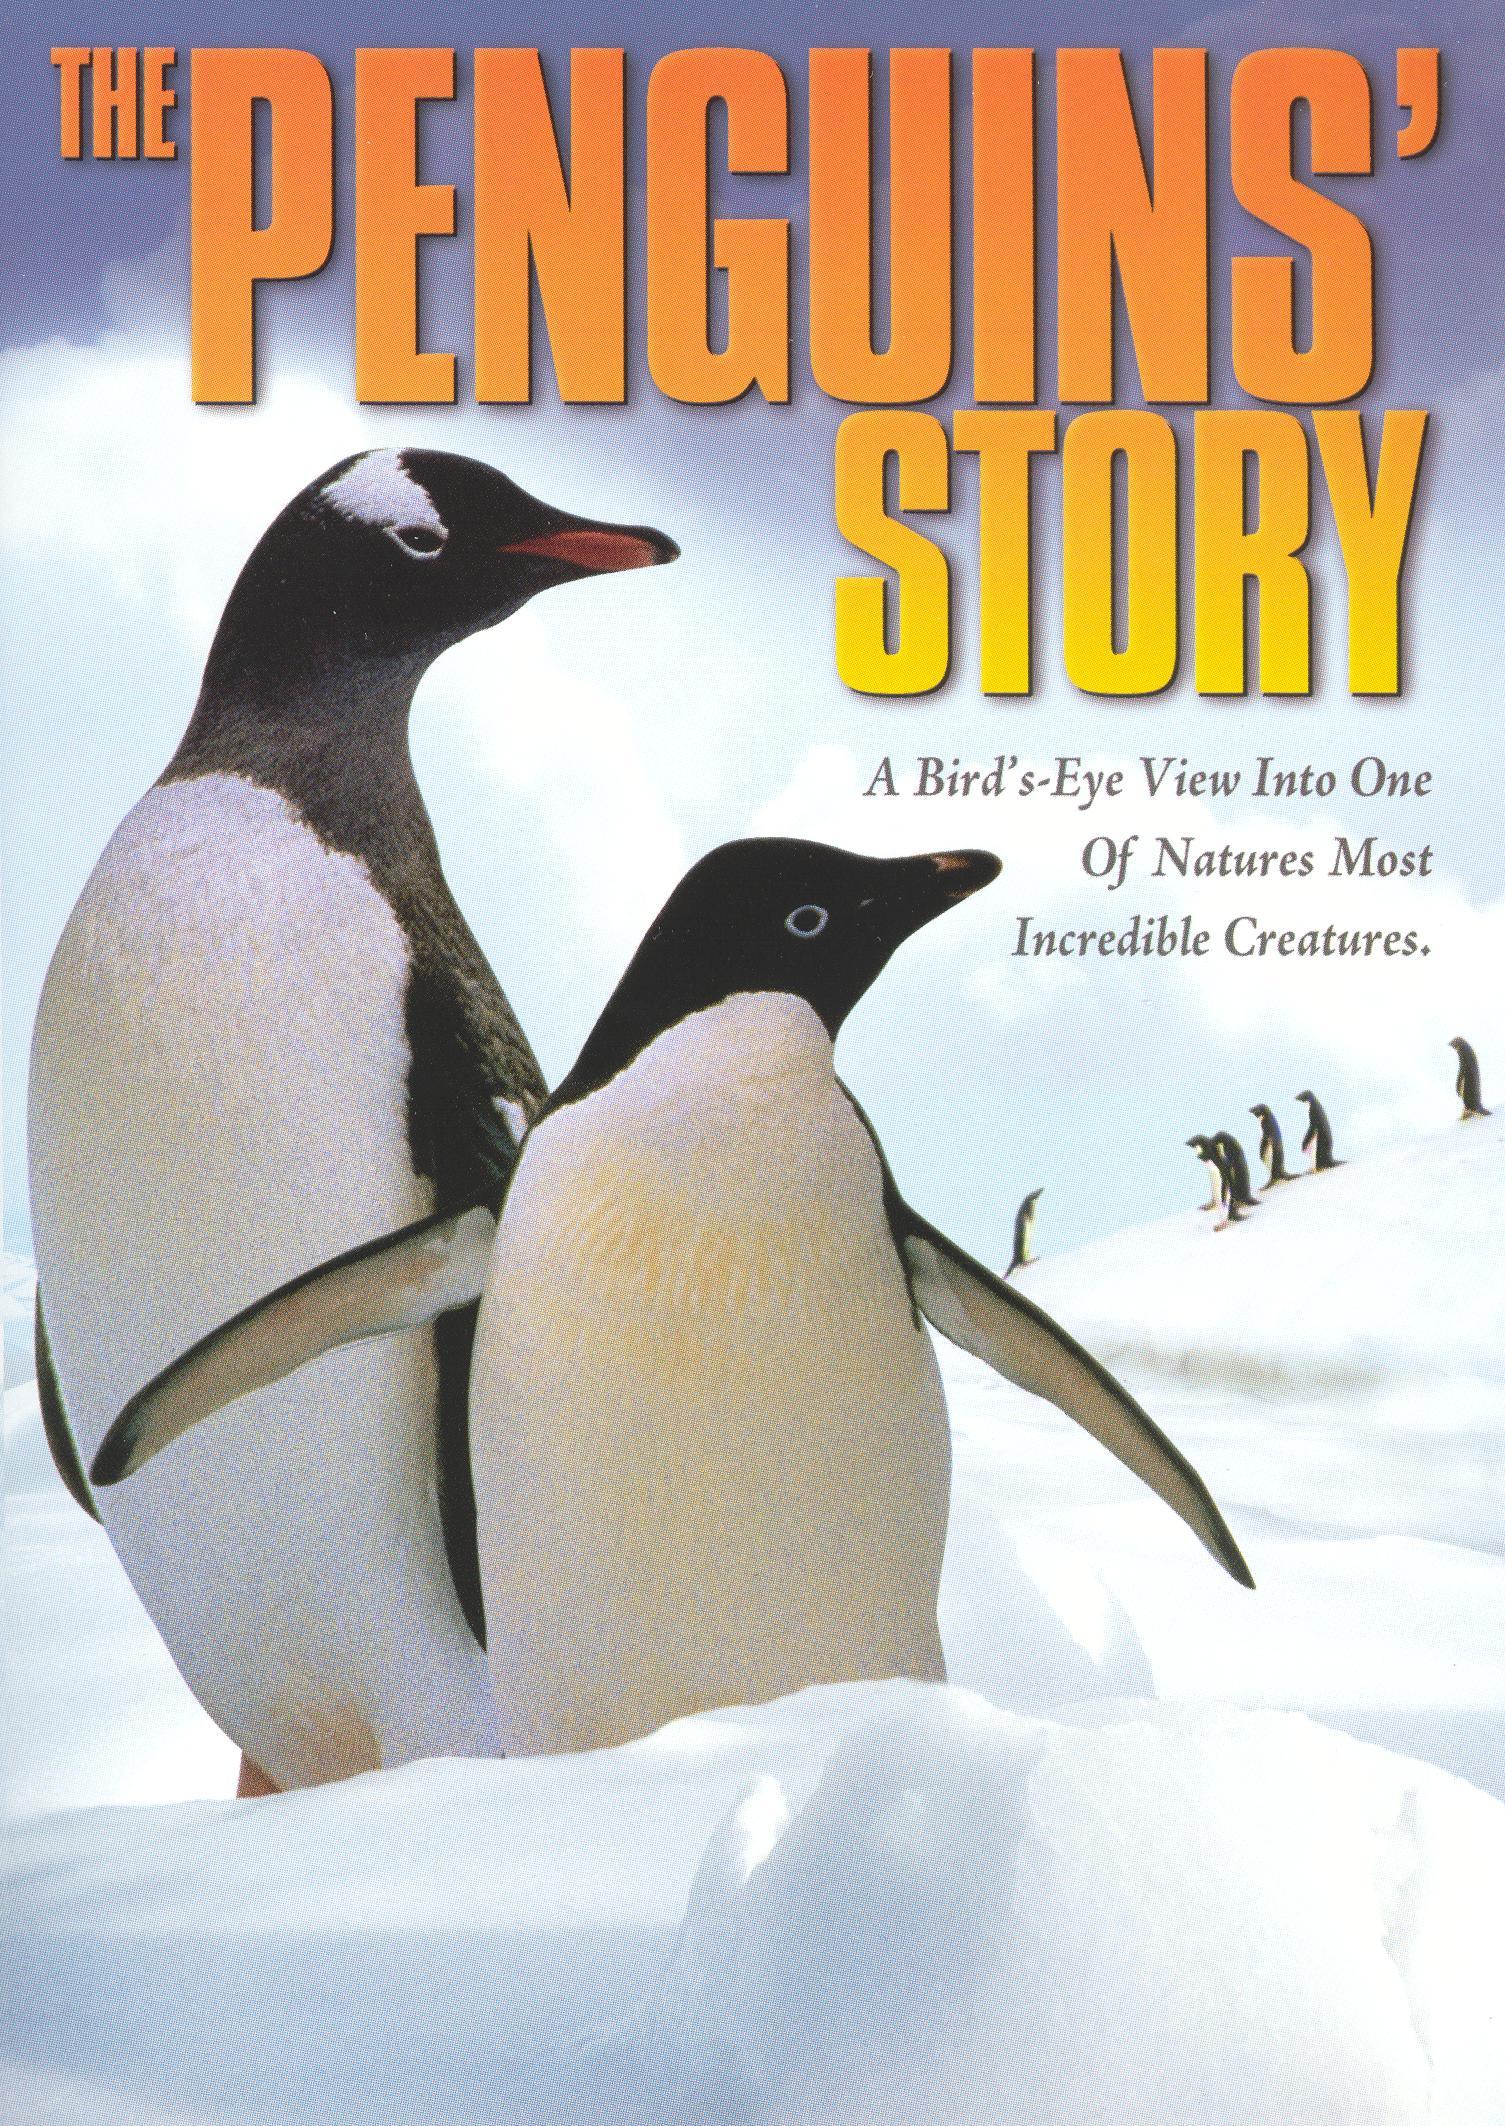 The Penguins' Journey